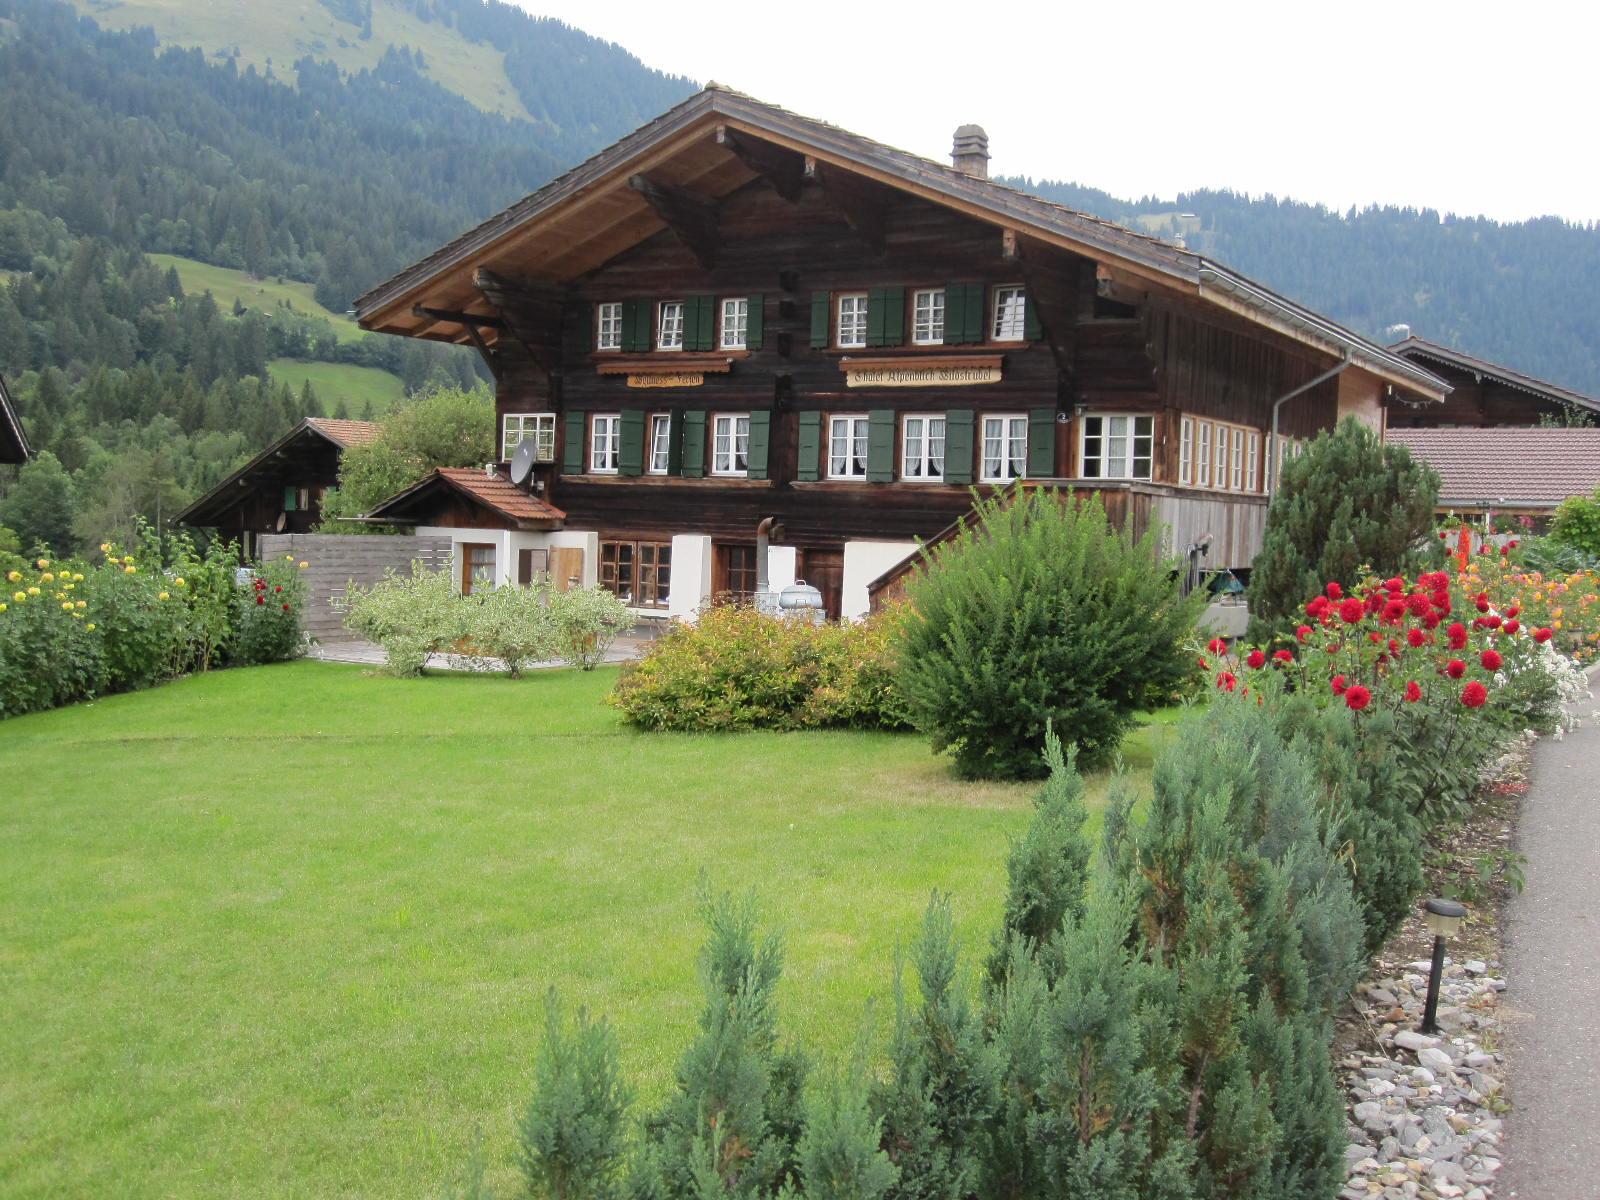 Chalet-Hotel Alpenblick Wildstrubel 4